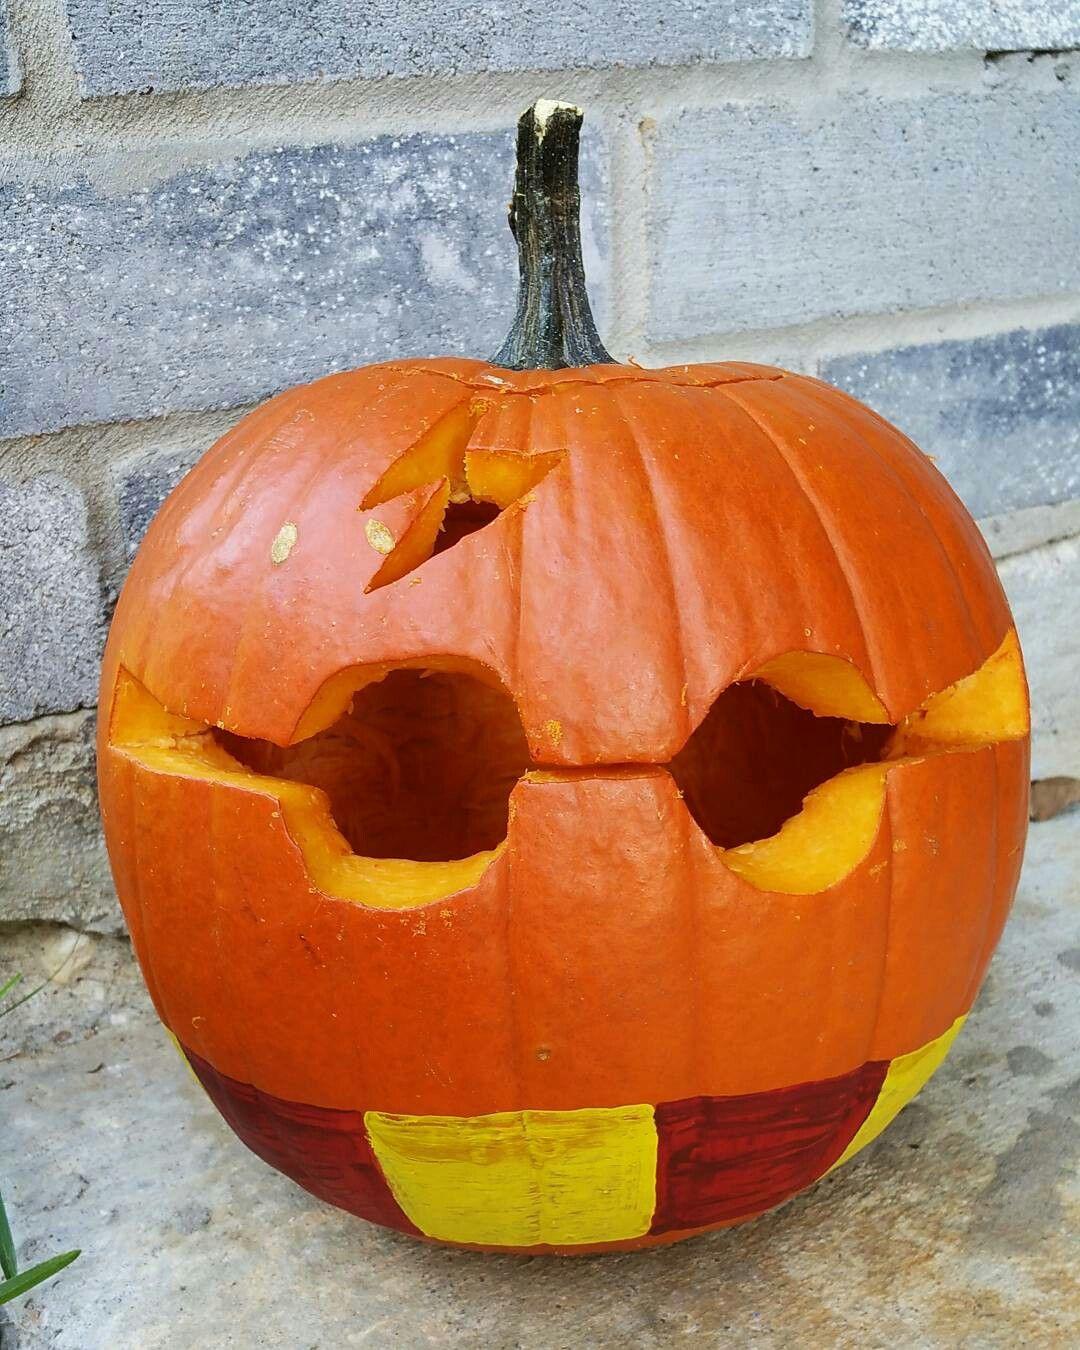 Harry Potter pumpkin carving! Harry potter pumpkin